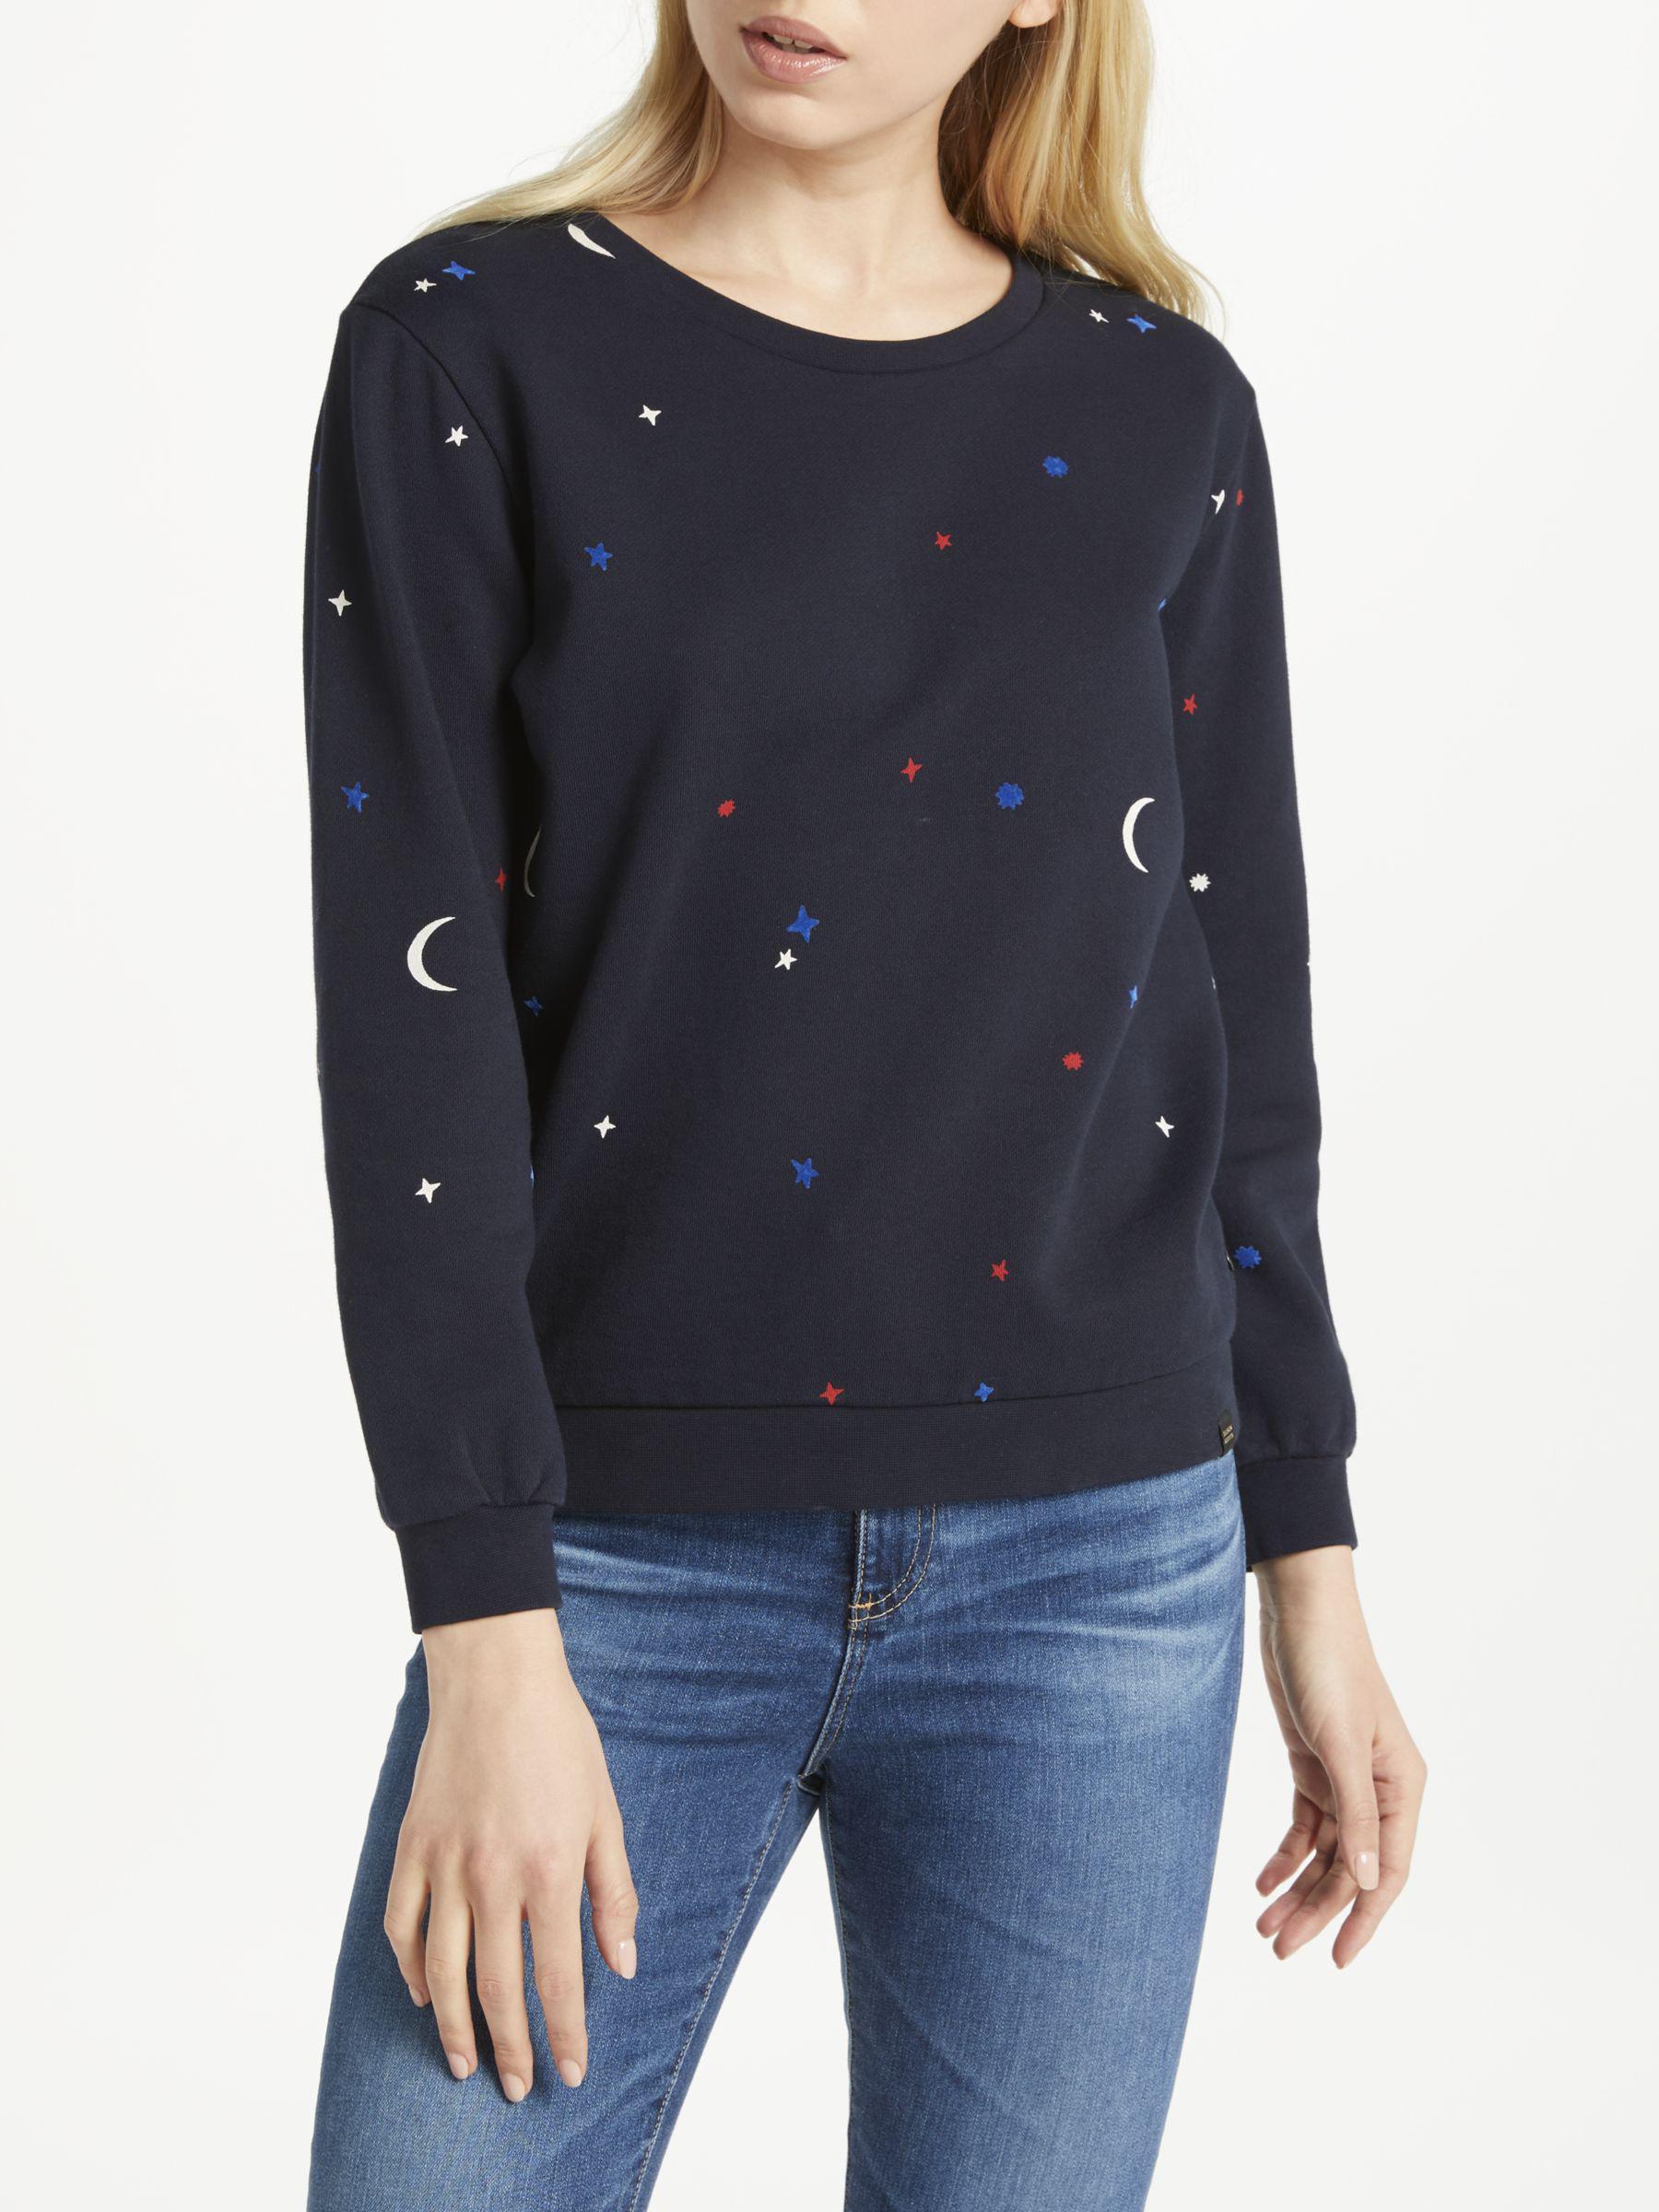 Maison Scotch Star Moon Print Sweater in Blue - Lyst 1e81cef5497e